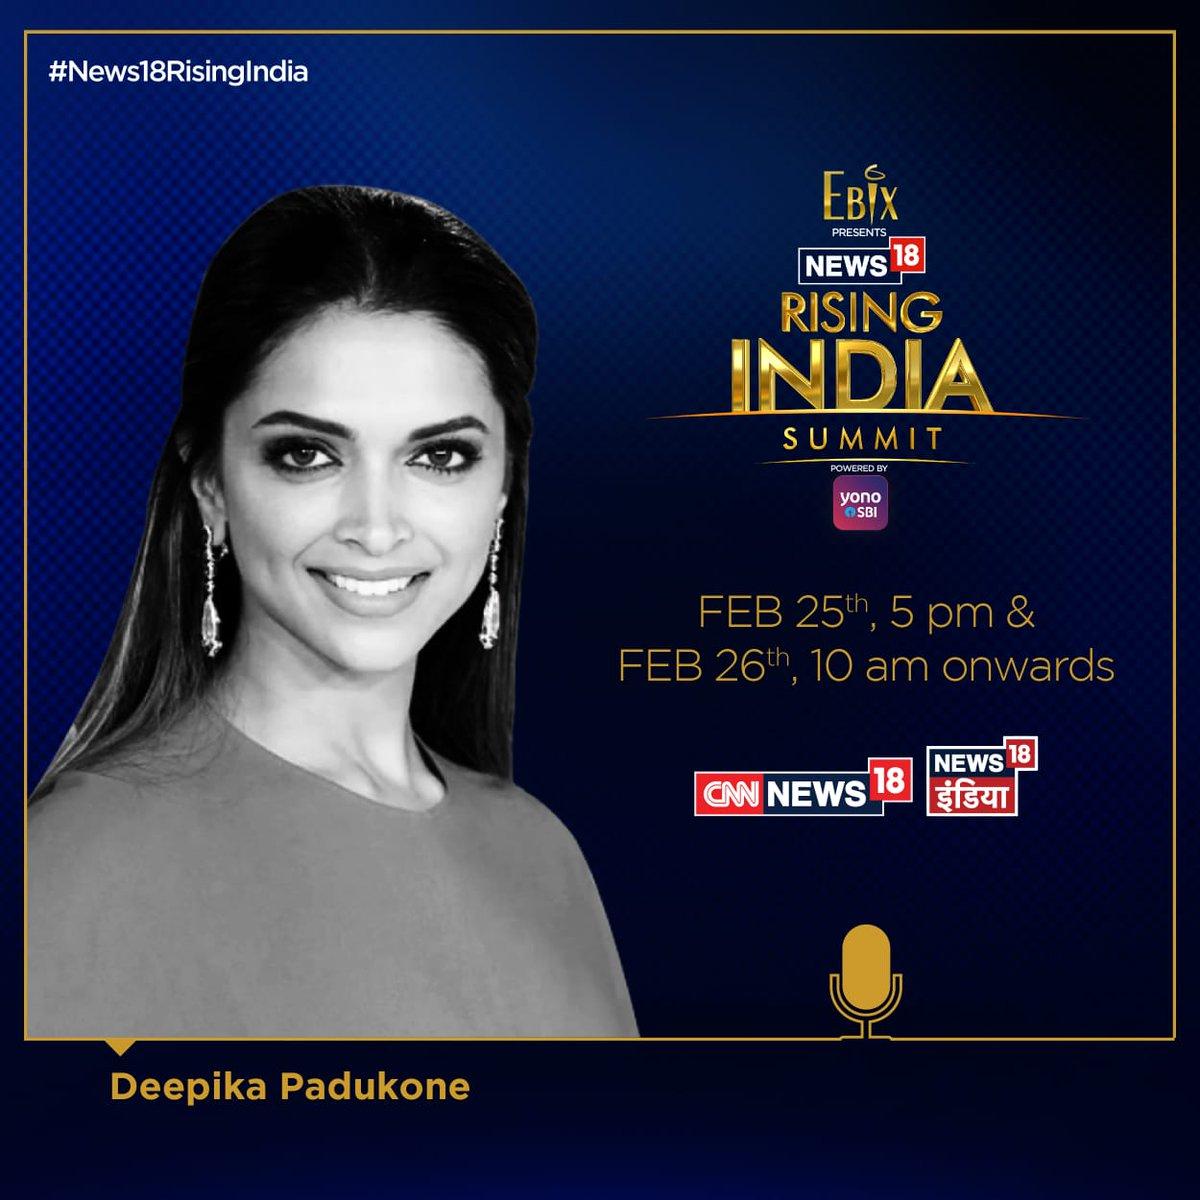 Don't miss out on #News18RisingIndia Summit 2019. Stay Tuned.   @EbixIndia @TheOfficialSBI #YONOSBI @UPGovt @OfficialJioTV  @deepikapadukone